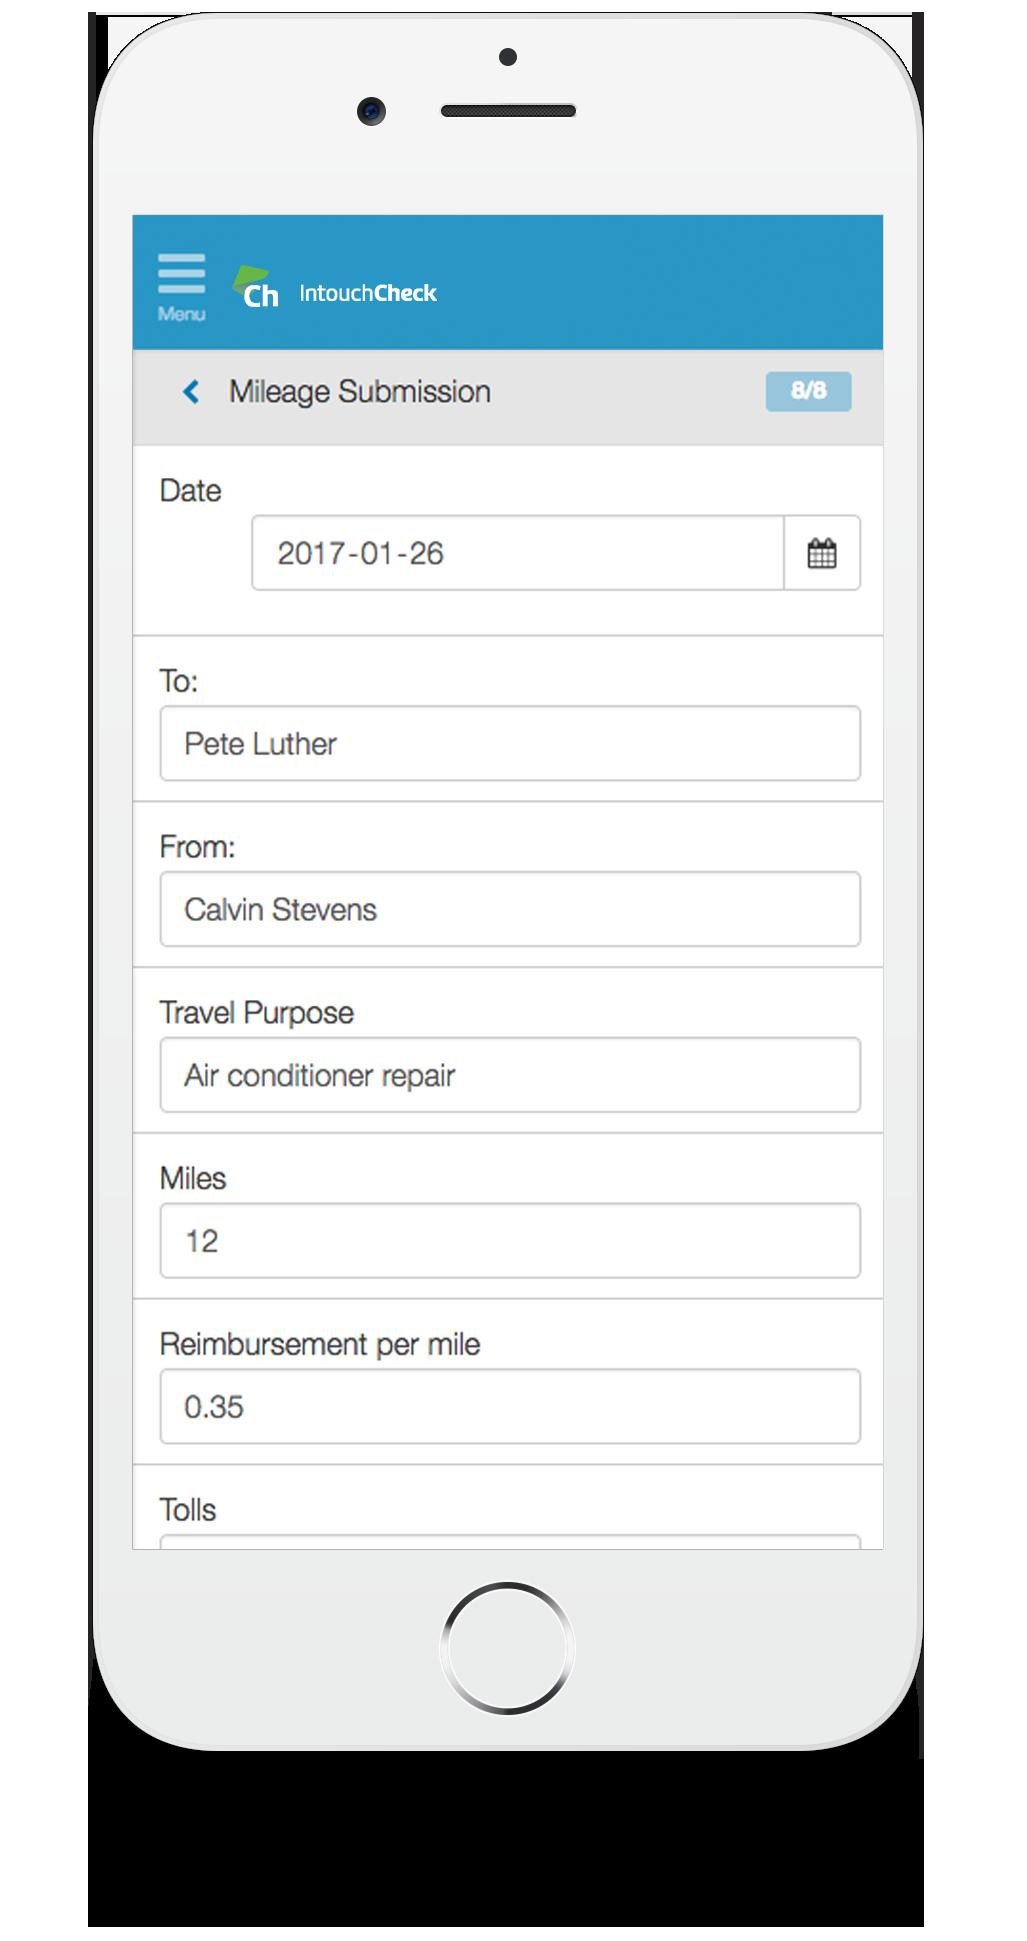 hvac-mileage-tracker-form-1.png